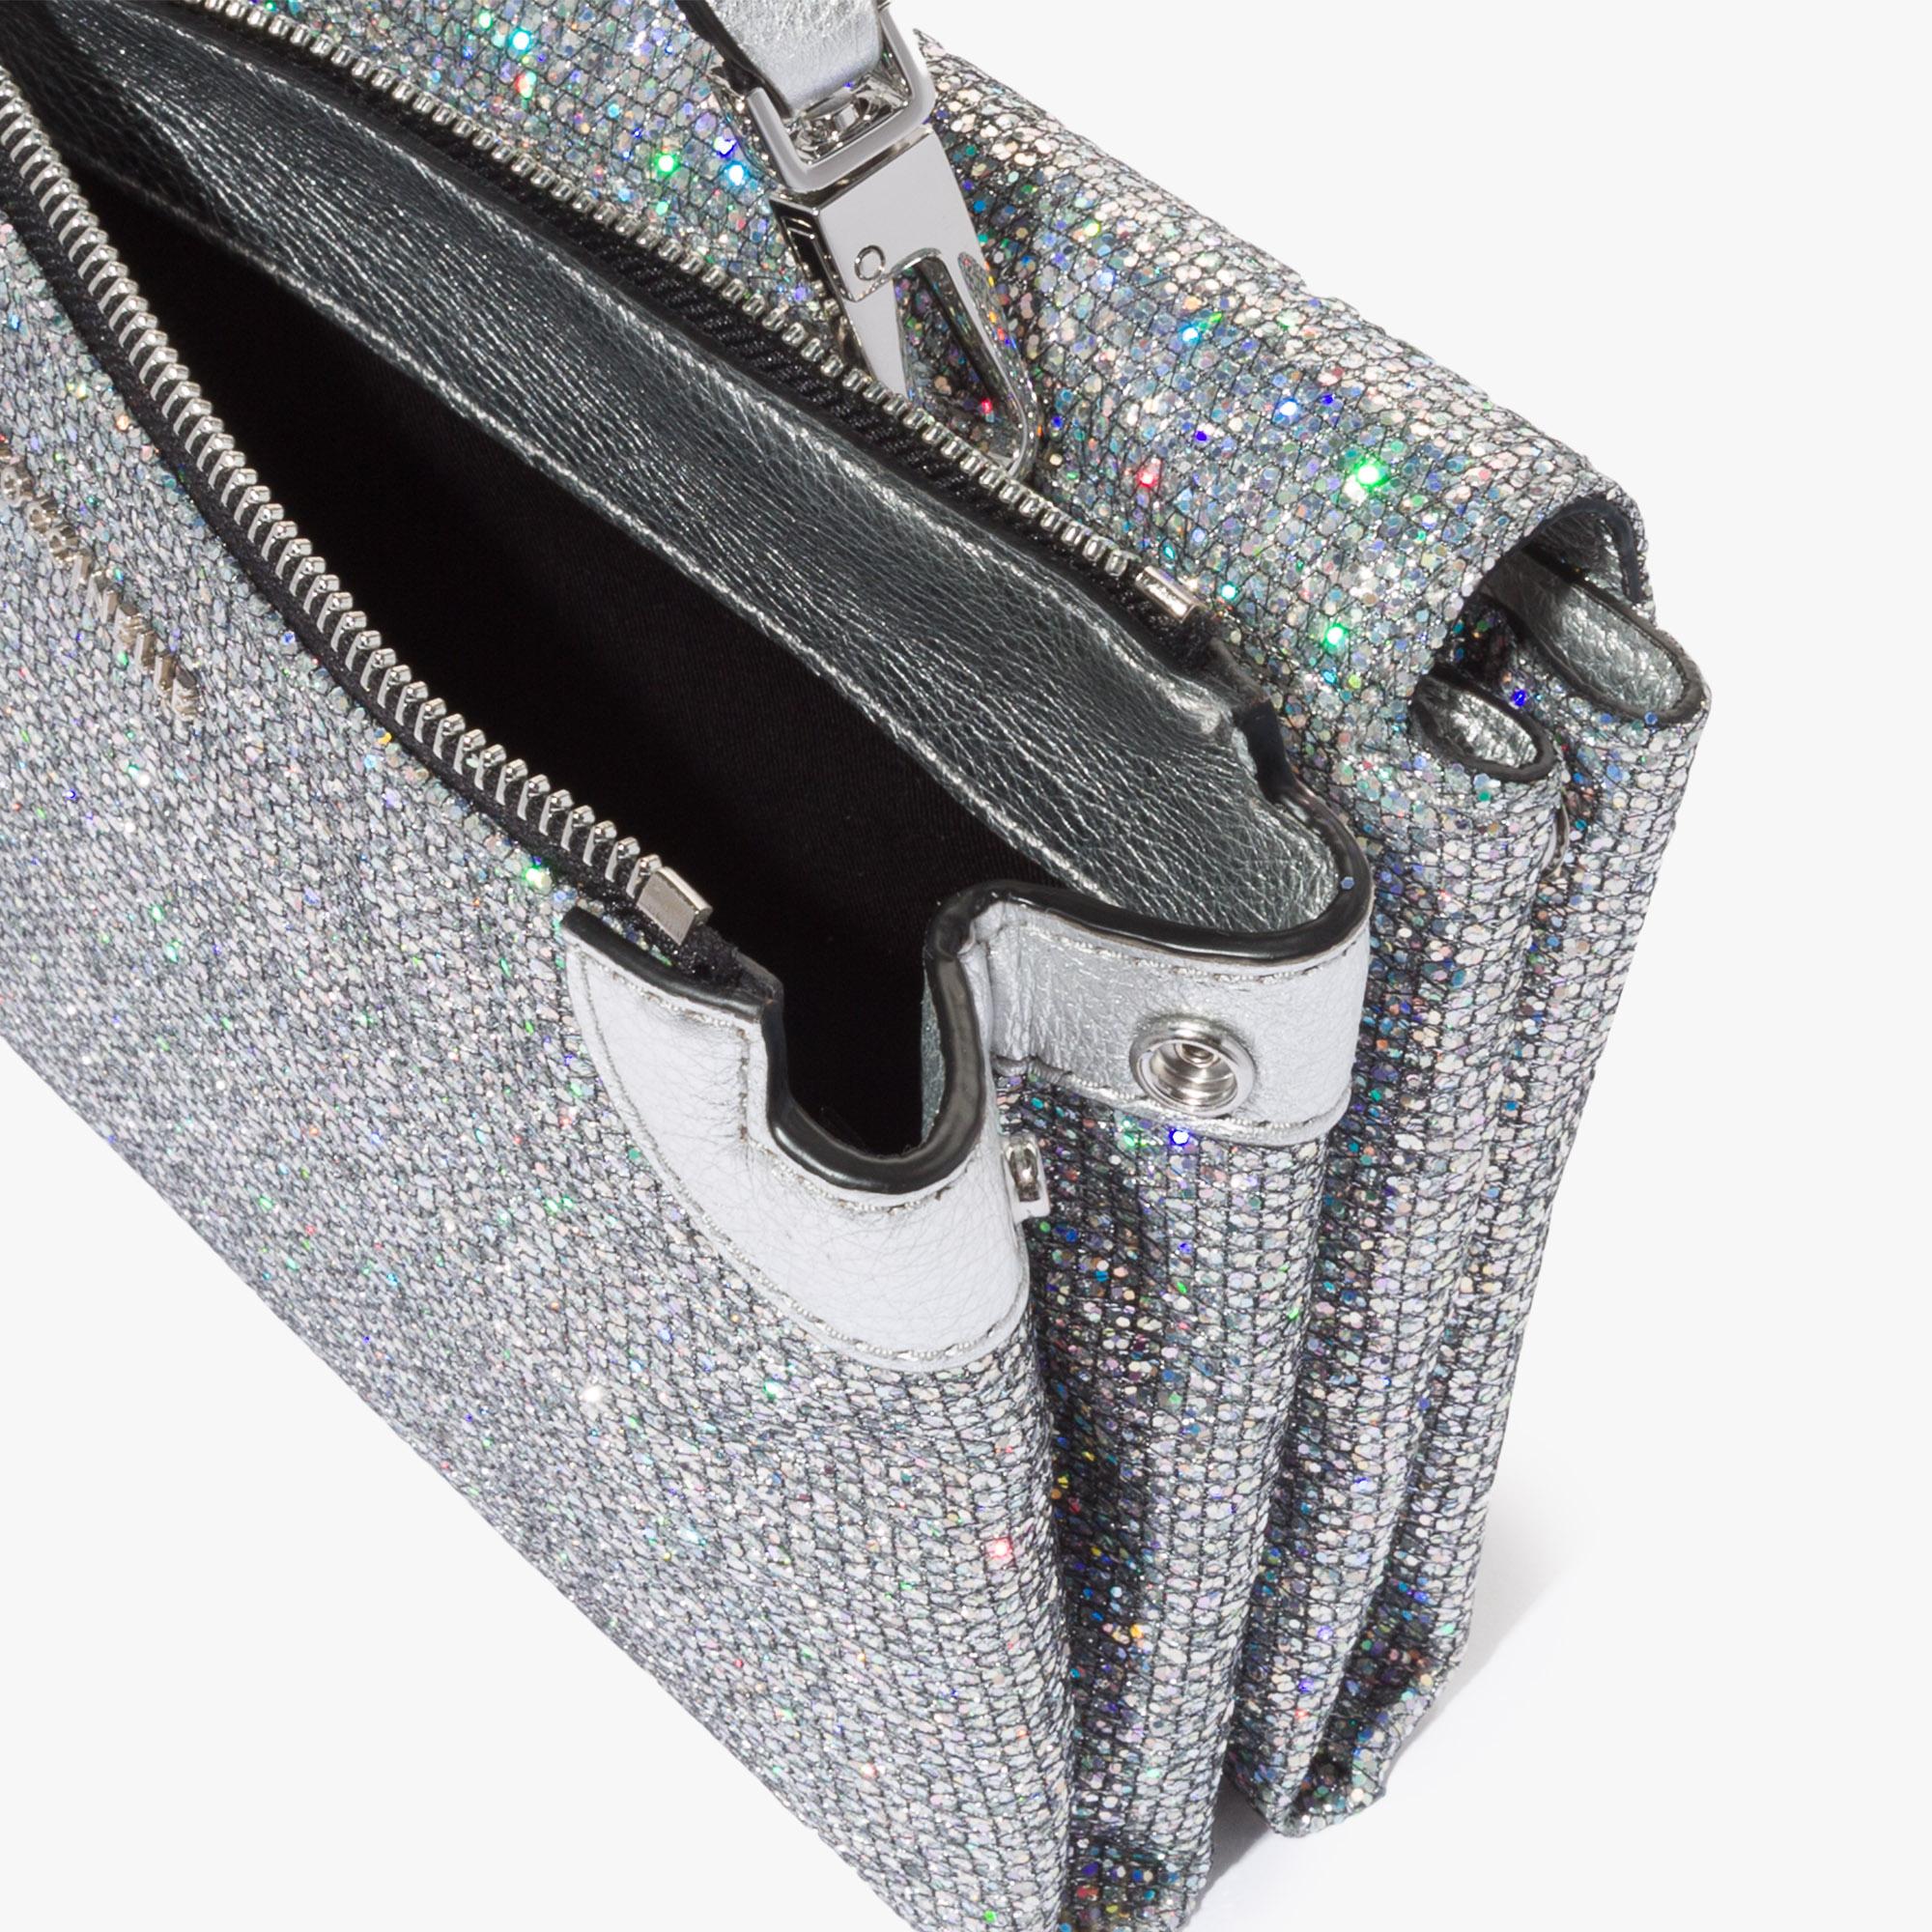 Arlettis mini bag in glitter fabric